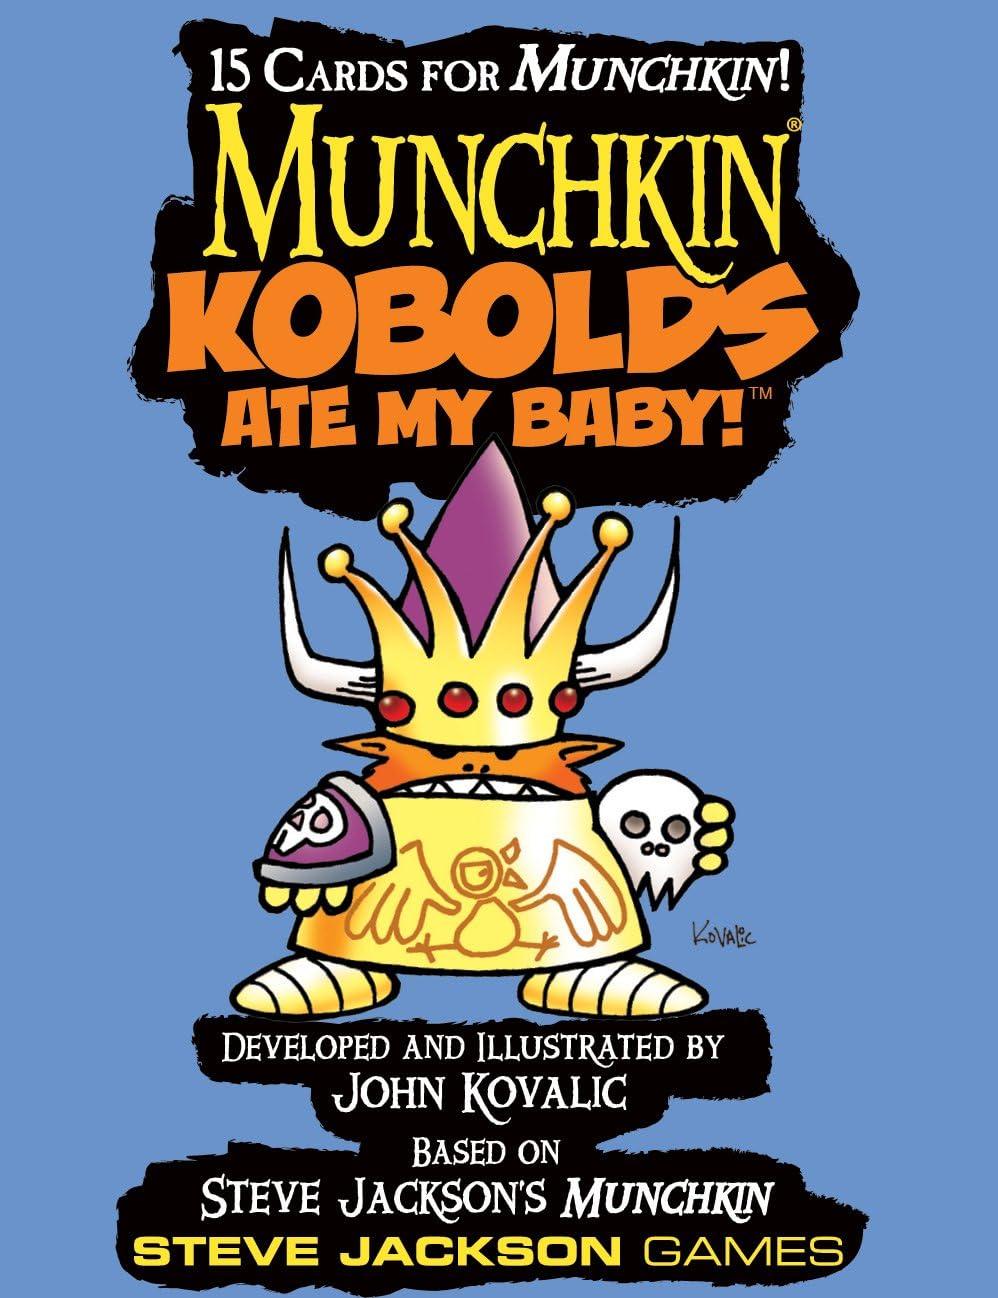 Steve Jackson Games Munchkin Kobolds Ate My Baby Booster Pack – Juego de Tarjeta de D10: Amazon.es: Juguetes y juegos